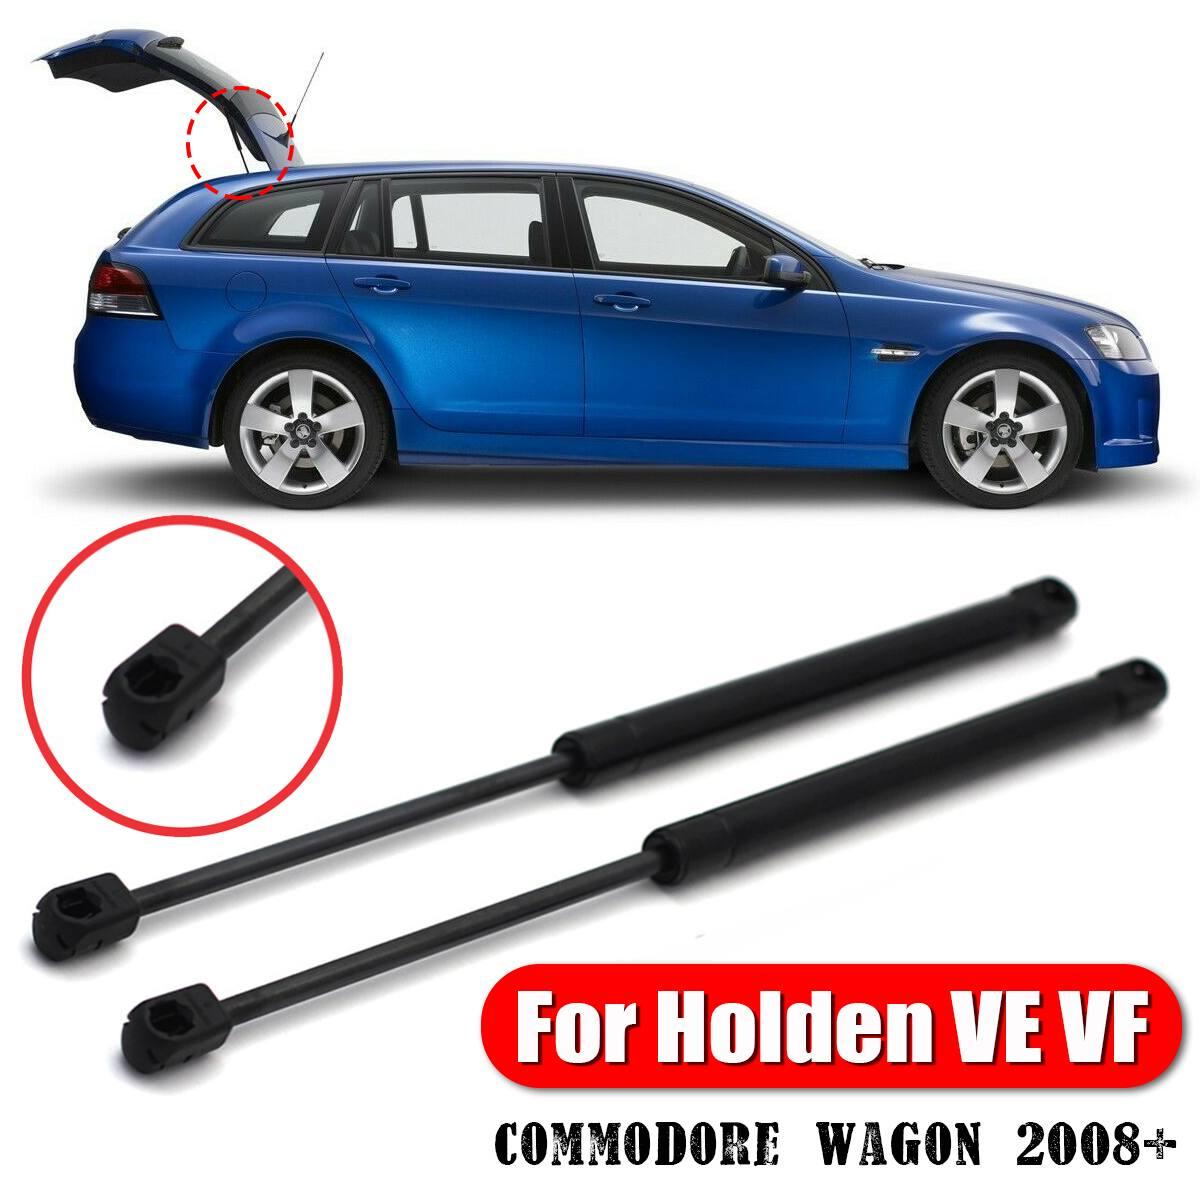 2 adet Araba Arka Bagaj kapağı bagaj gaz lifti Desteği Struts bar Holden VE VF Commodore Vagon 2008 +